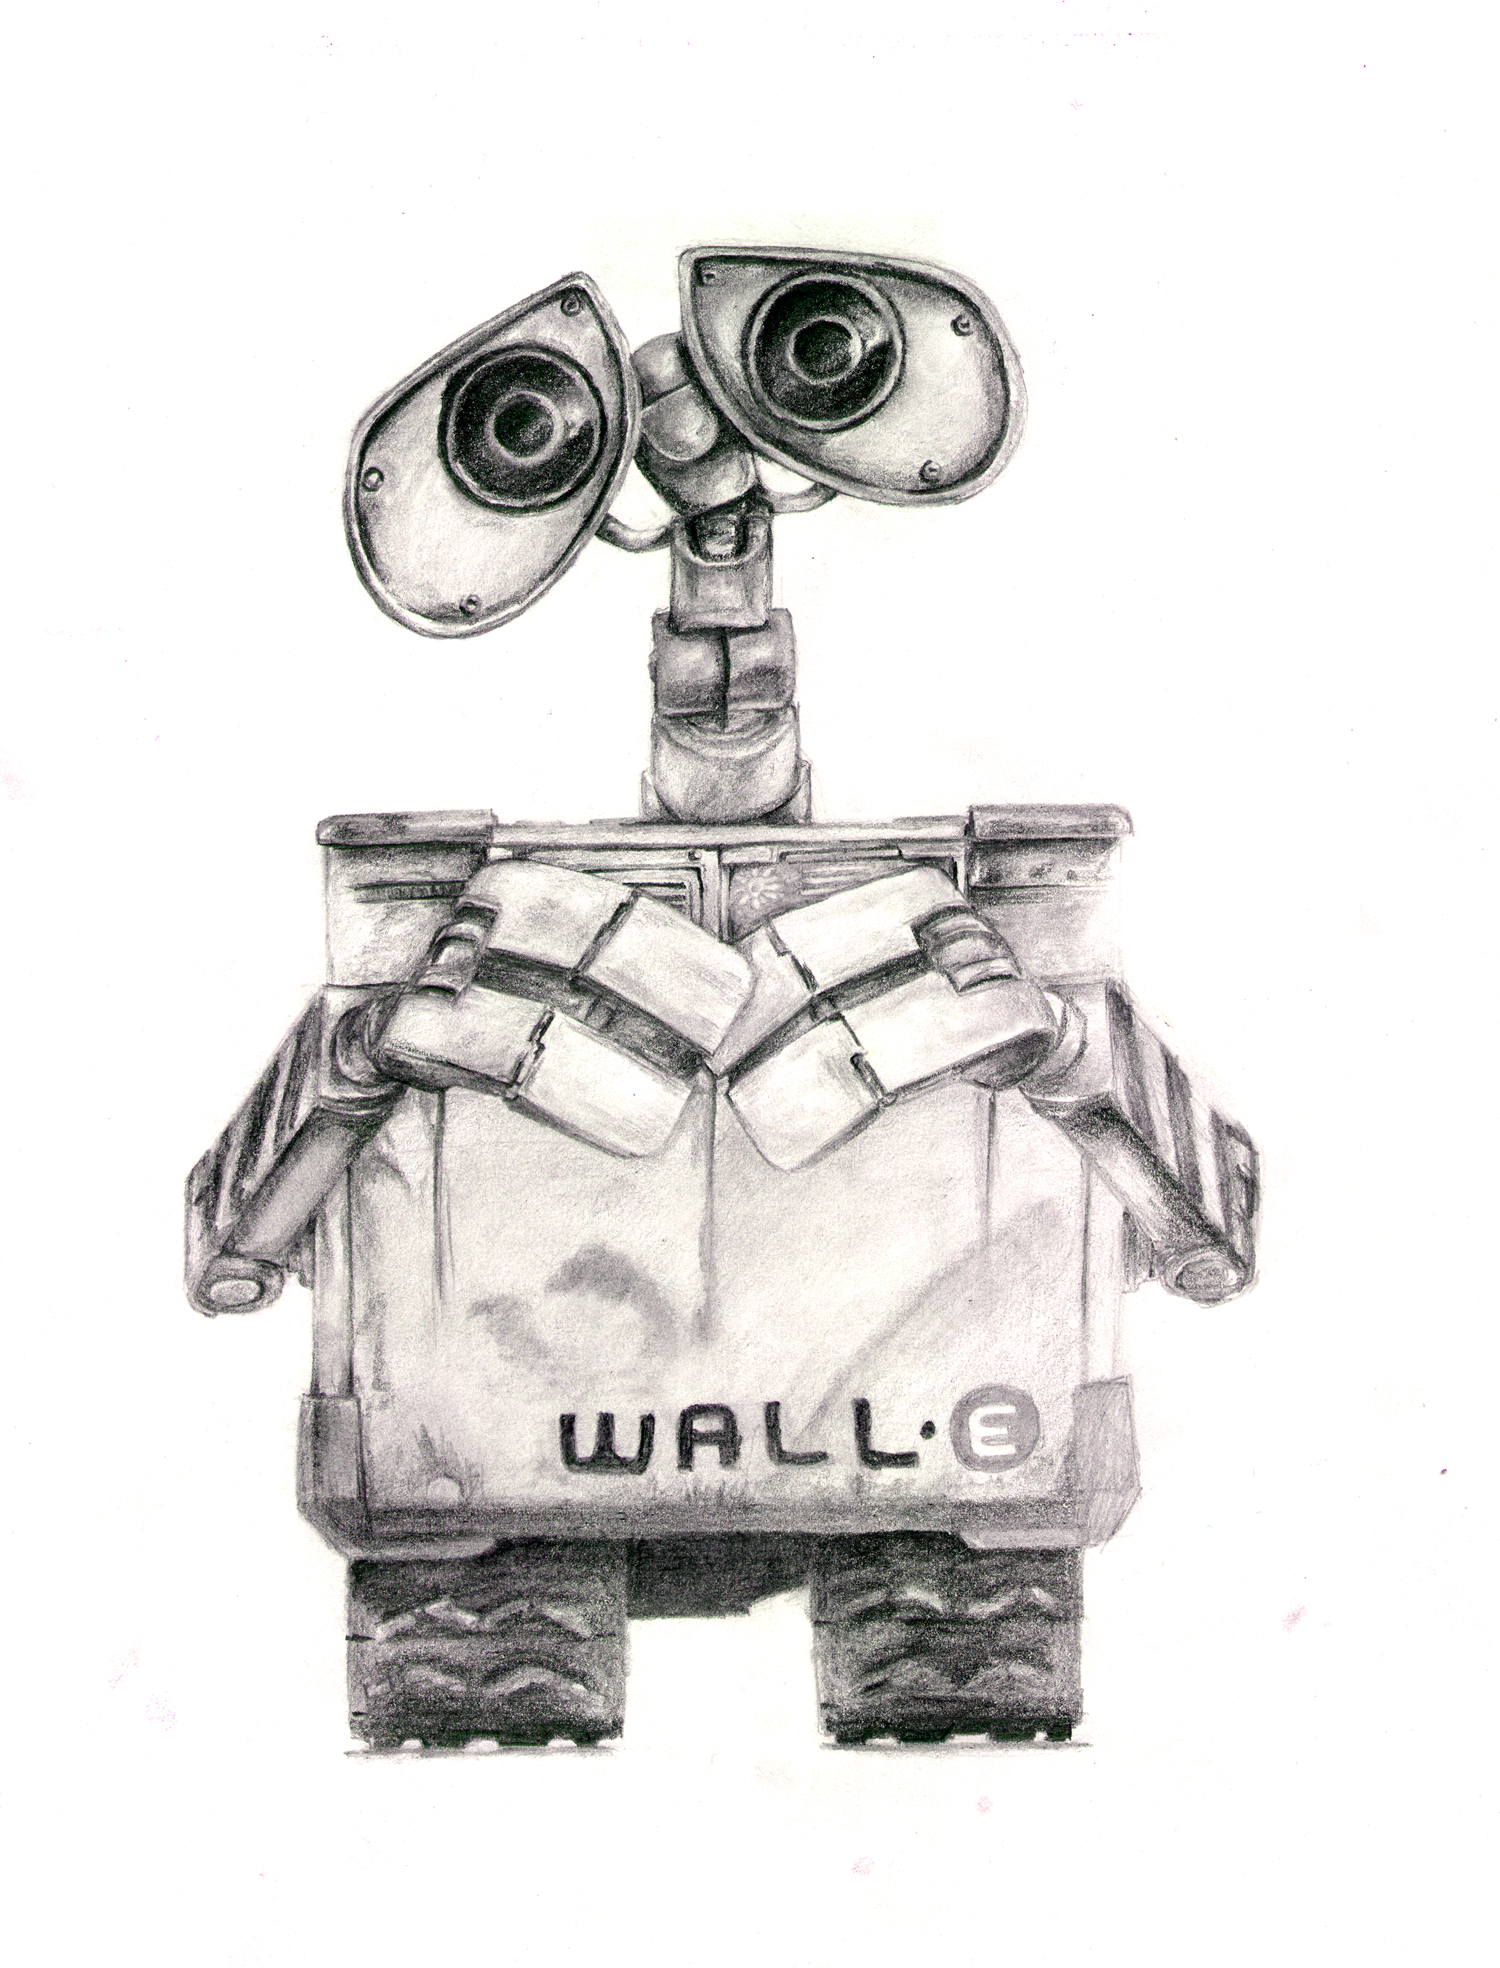 walle by R1V3G0 on deviantART